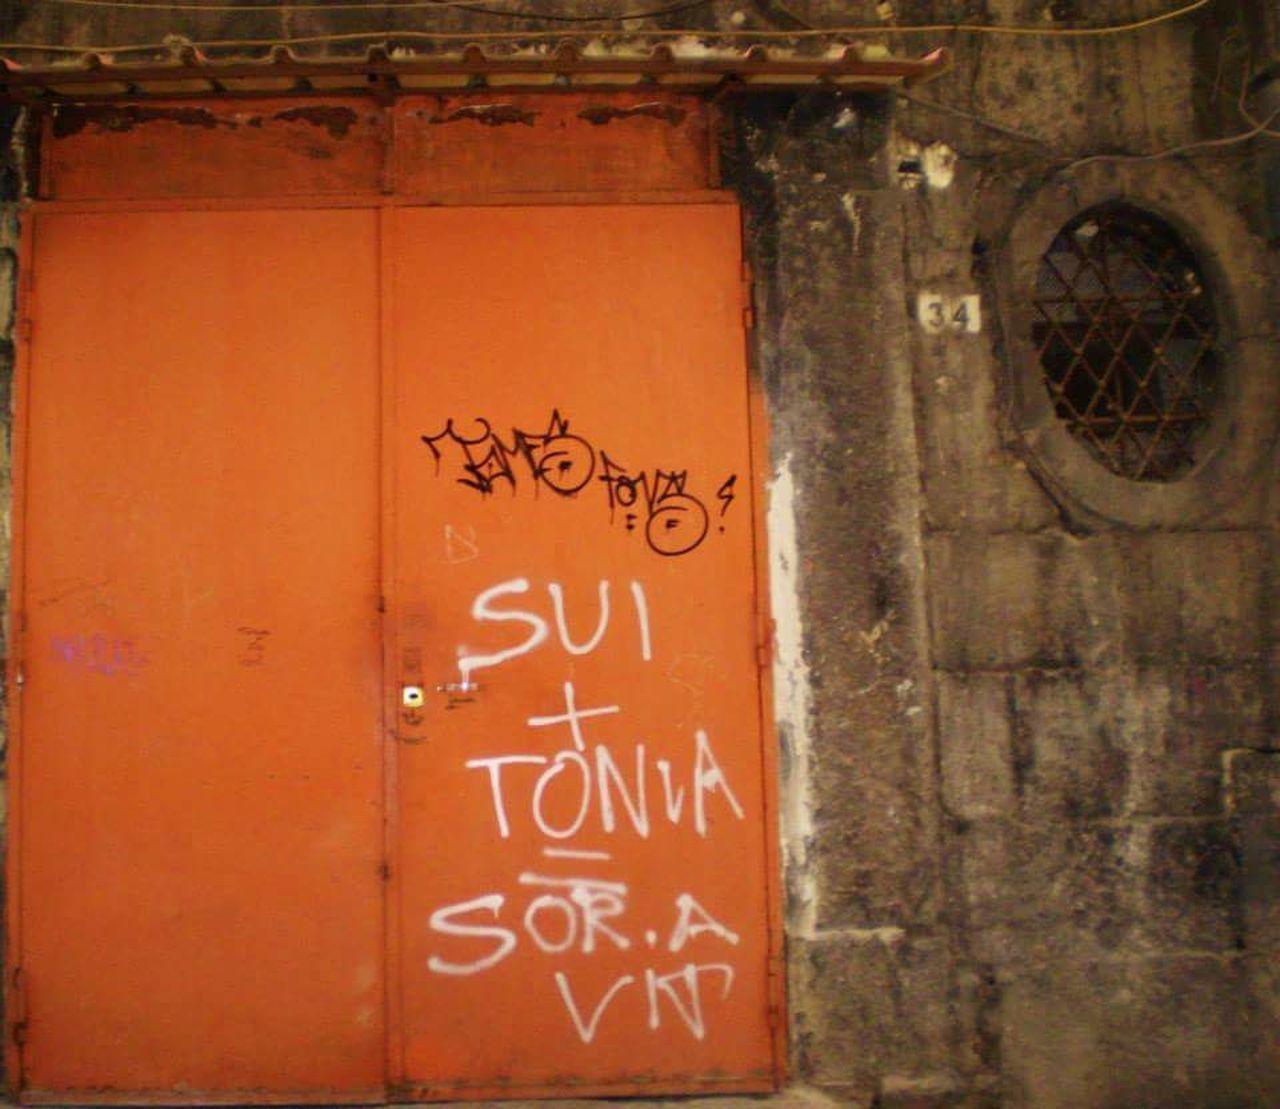 Napoli Napoli Street Napoli Italy Naples, Italy Door Orange Orangedoor Graffiti Window